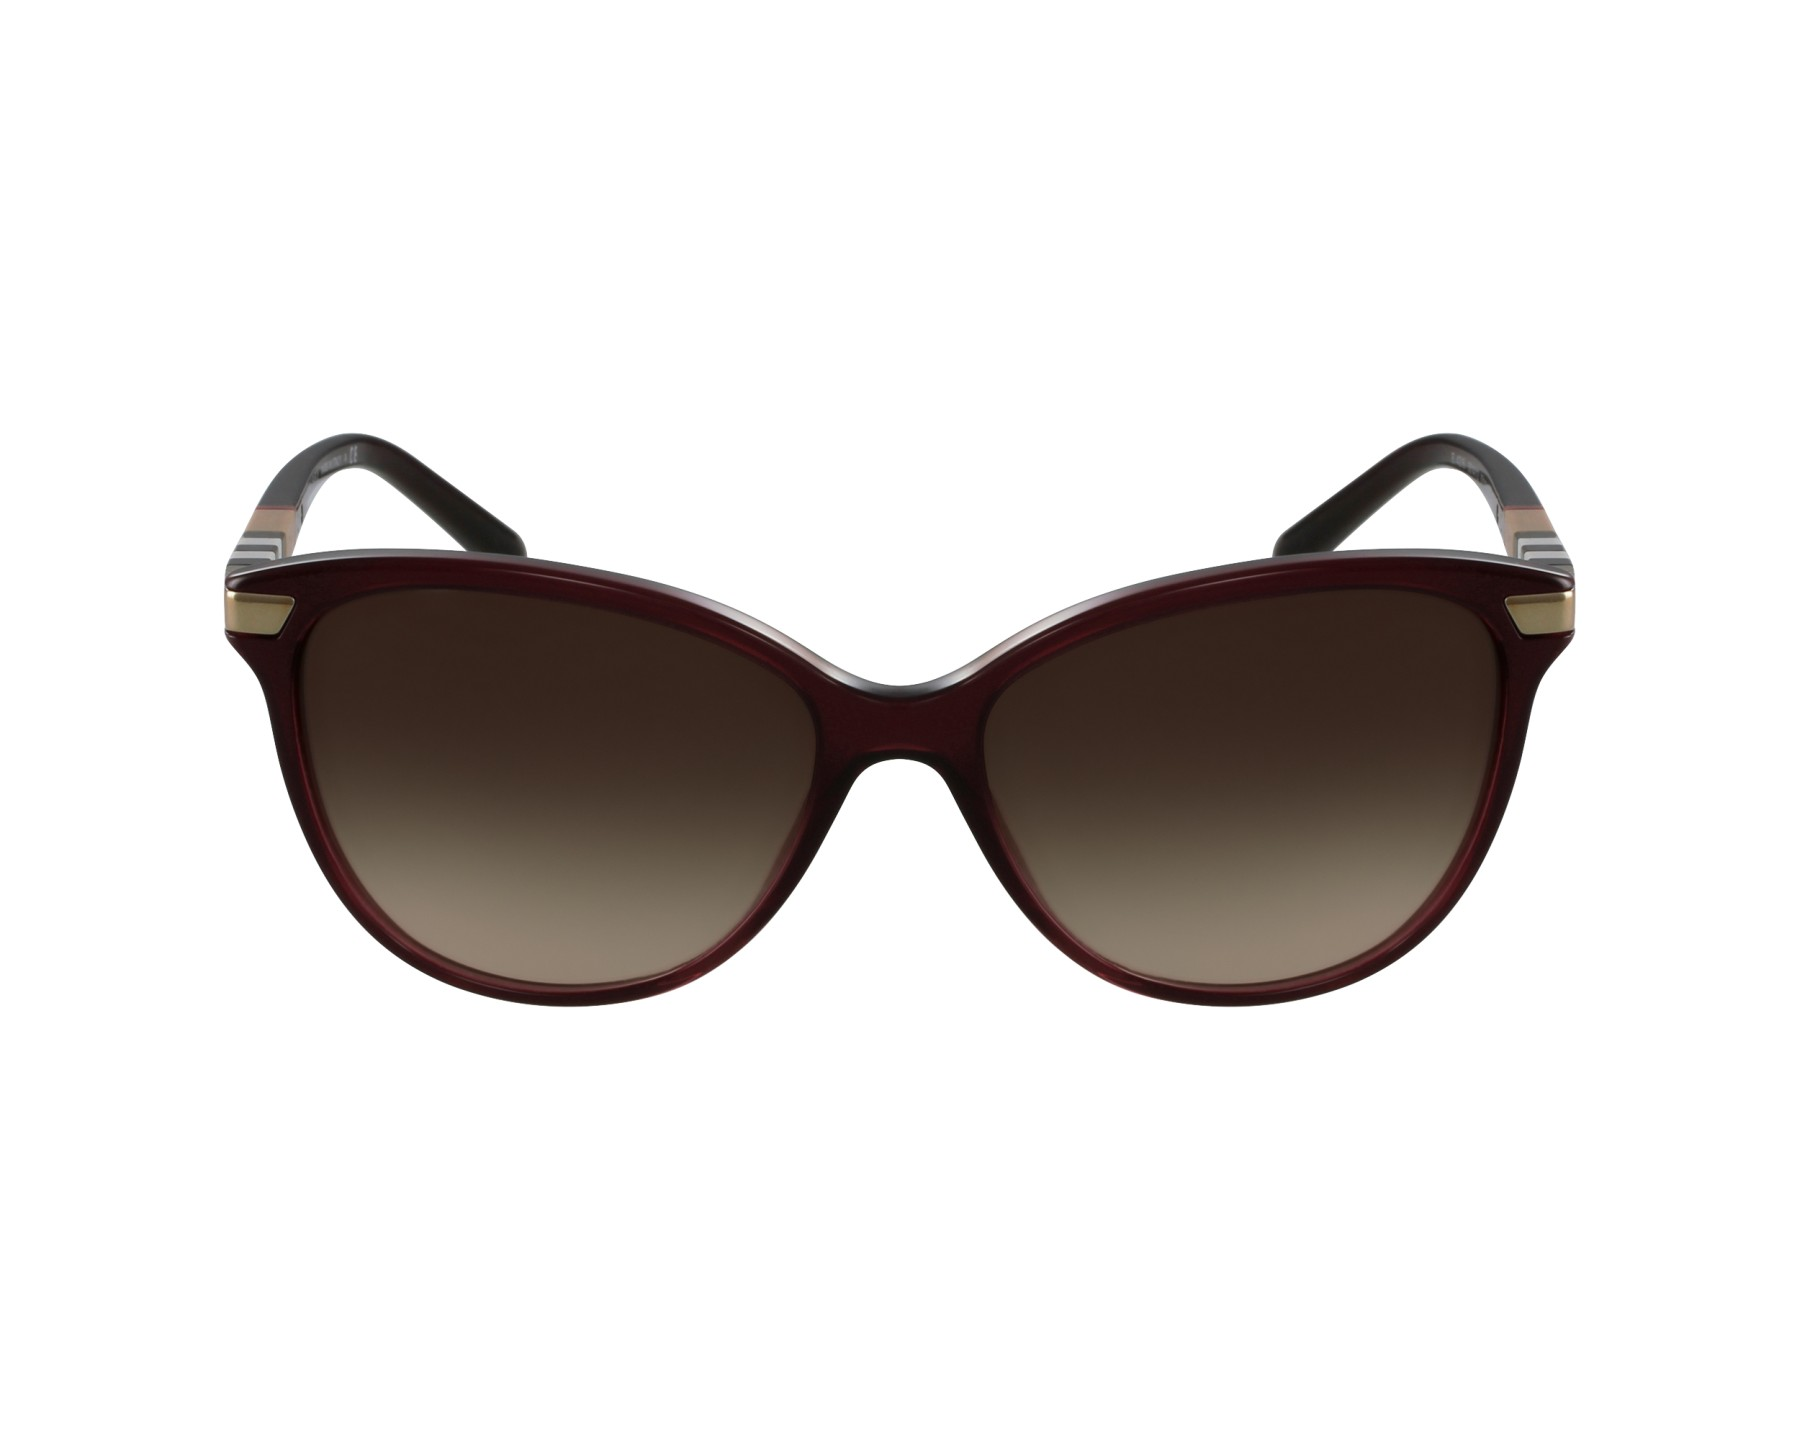 9f1fc148597 Sunglasses Burberry BE-4216 3014 13 57-16 Bordeaux Gold profile view